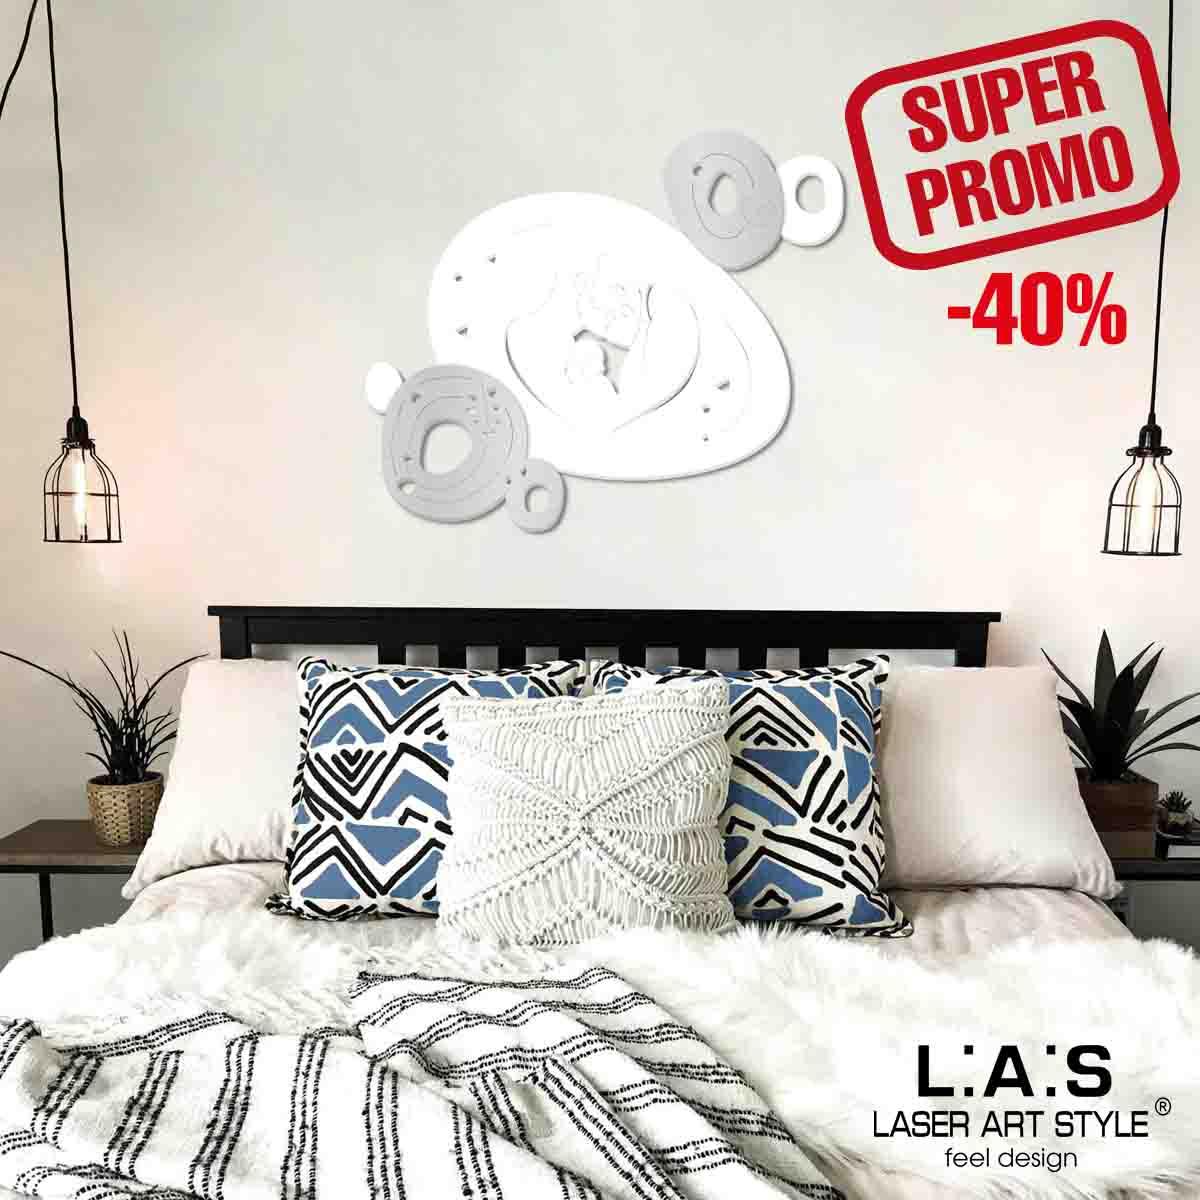 L:A:S - Laser Art Style - CAPEZZALE MODERNO SACRA FAMIGLIA SI-480XL BIANCO – ARGENTO